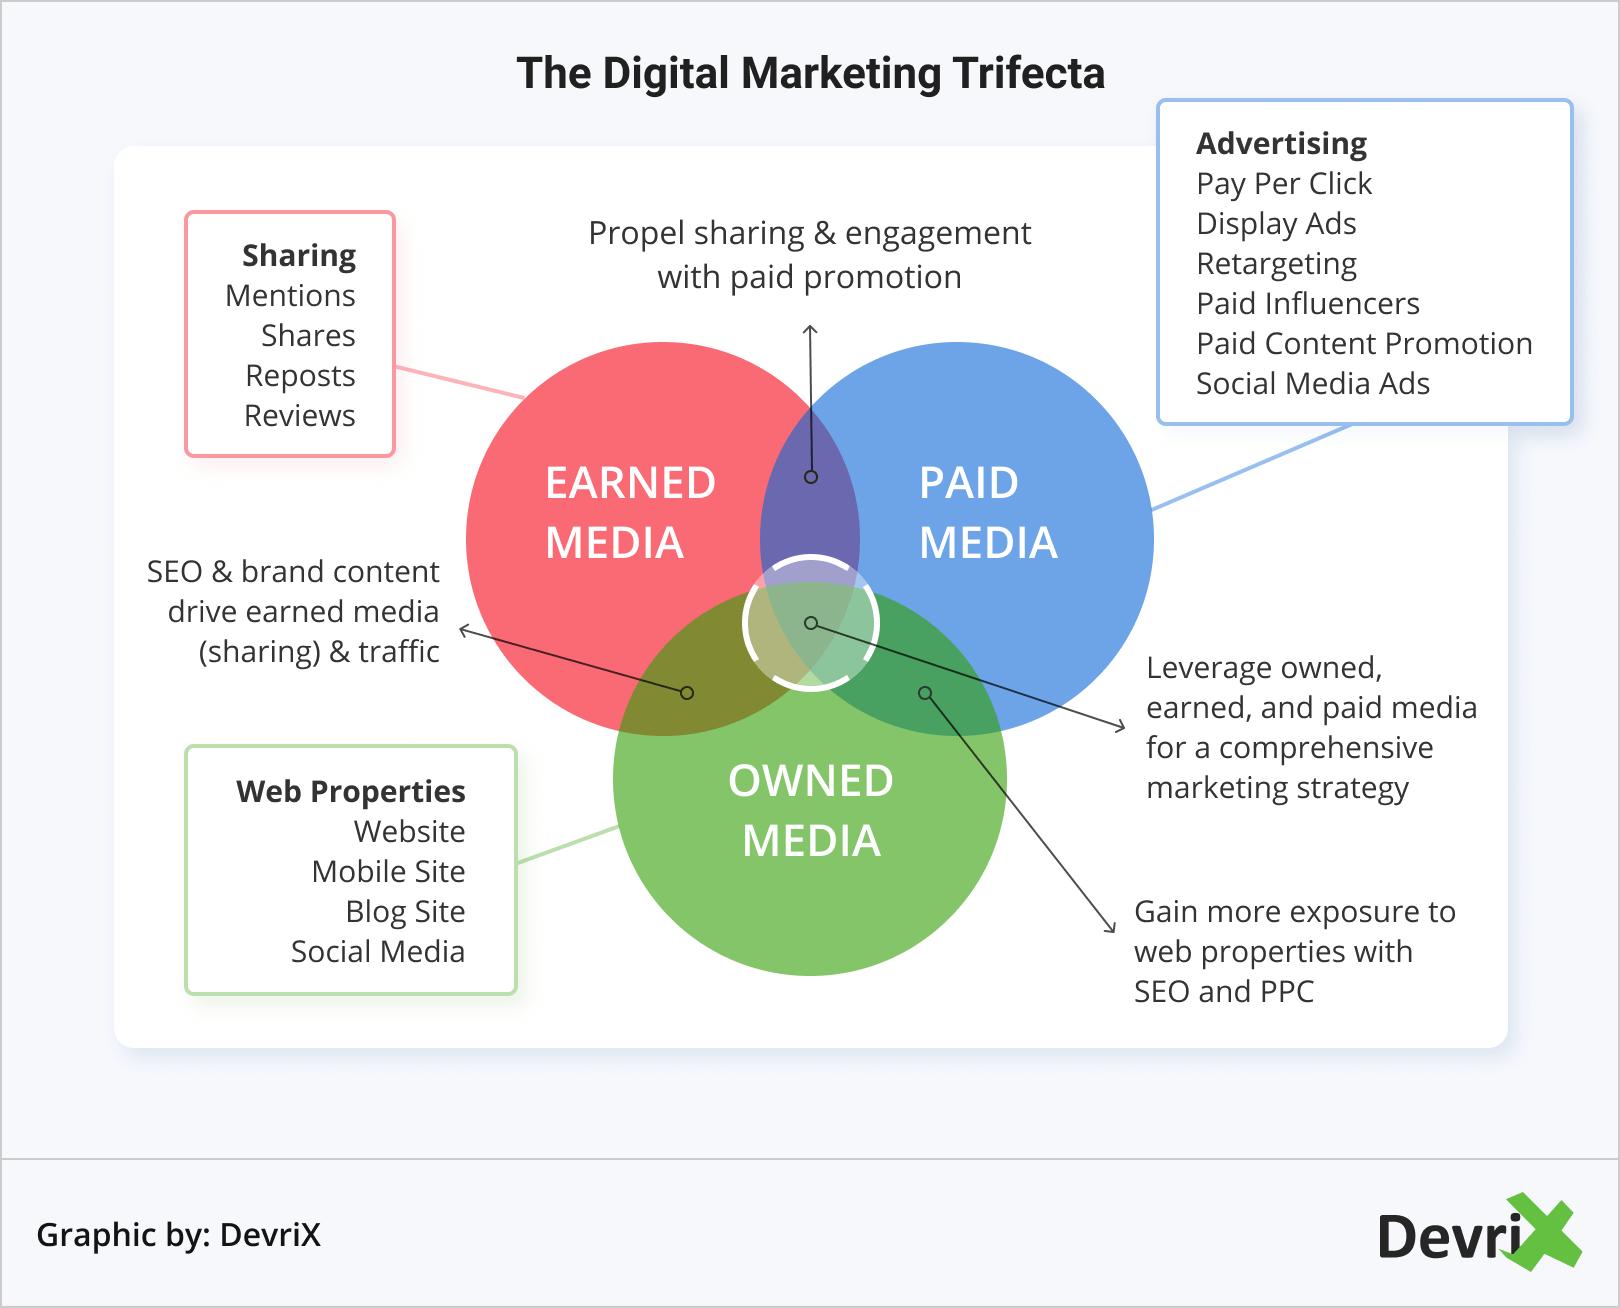 The Digital Marketing Trifecta